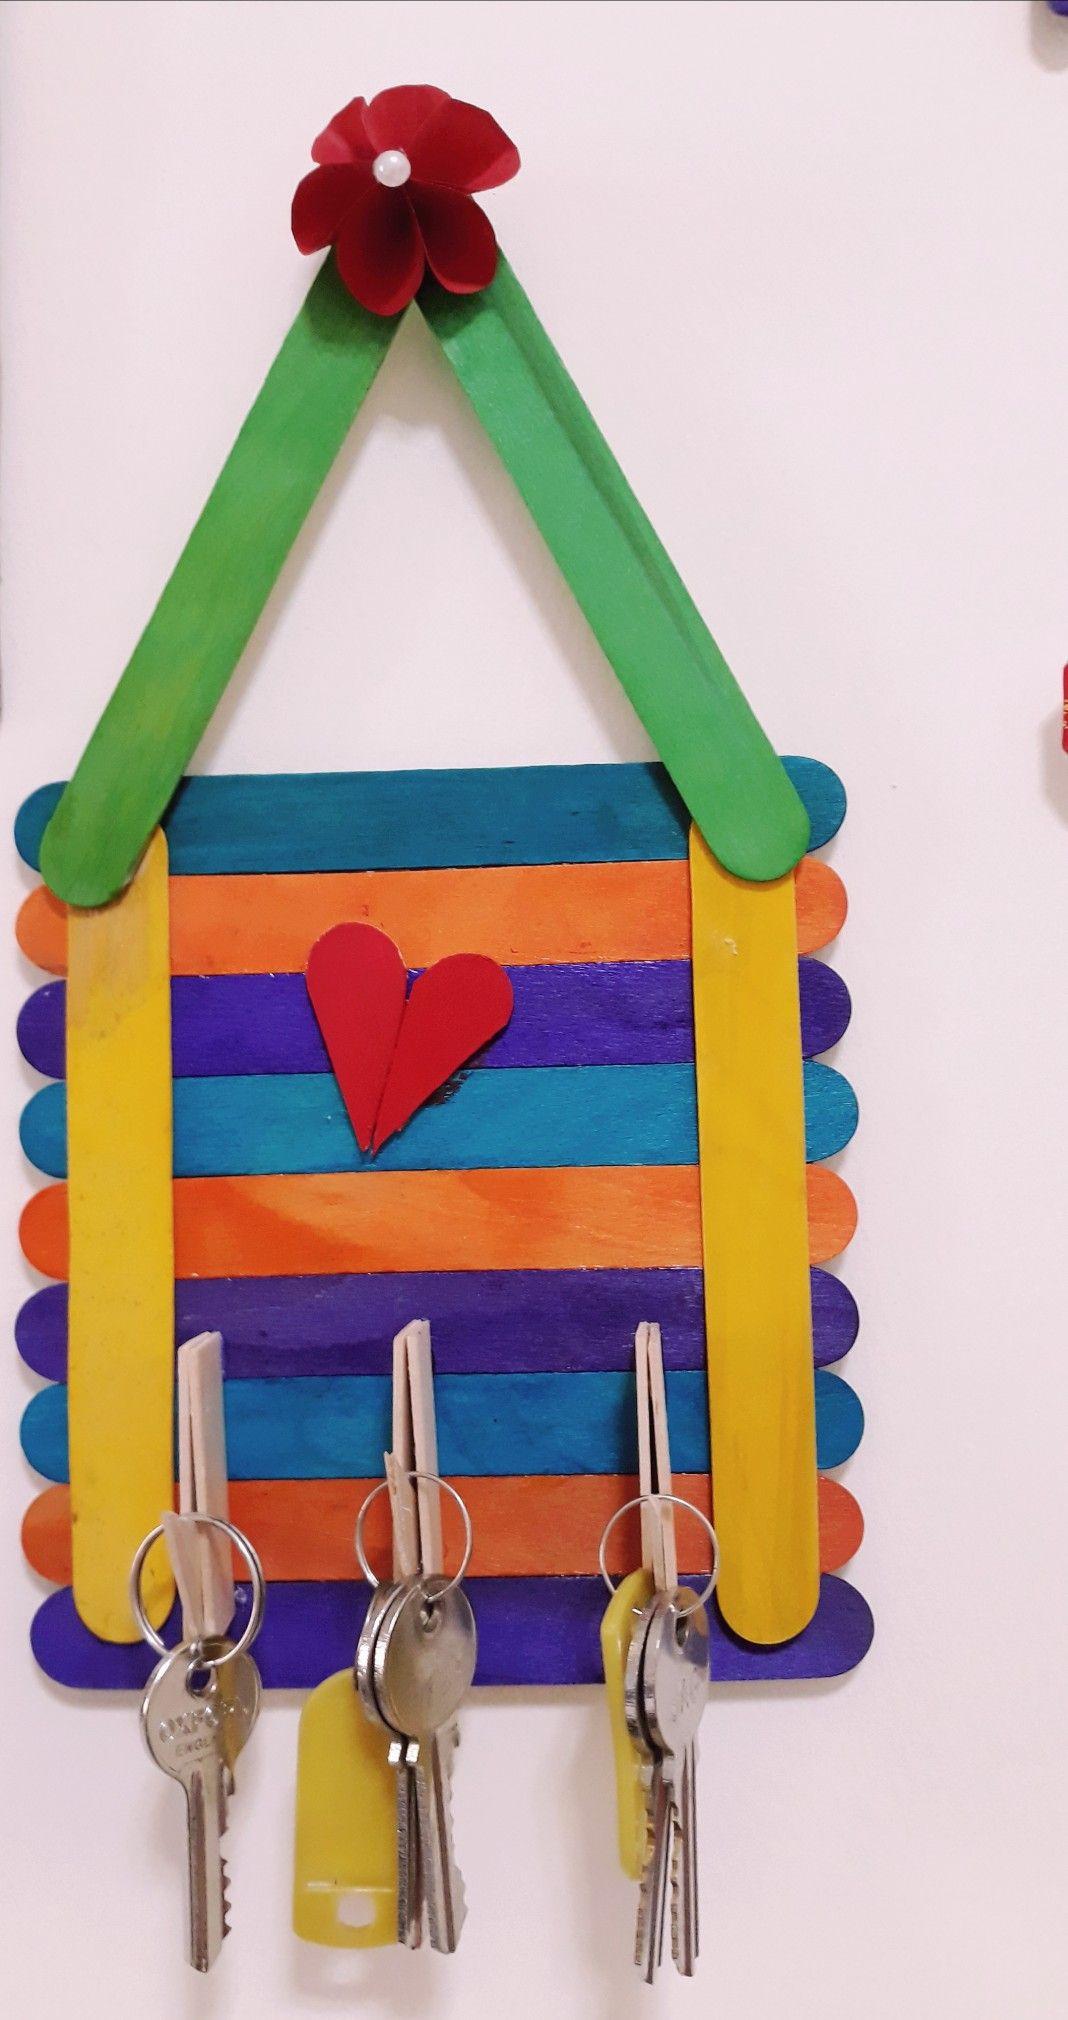 Diy Key Holder Using Popsicle Sticks Craft Stick Crafts Key